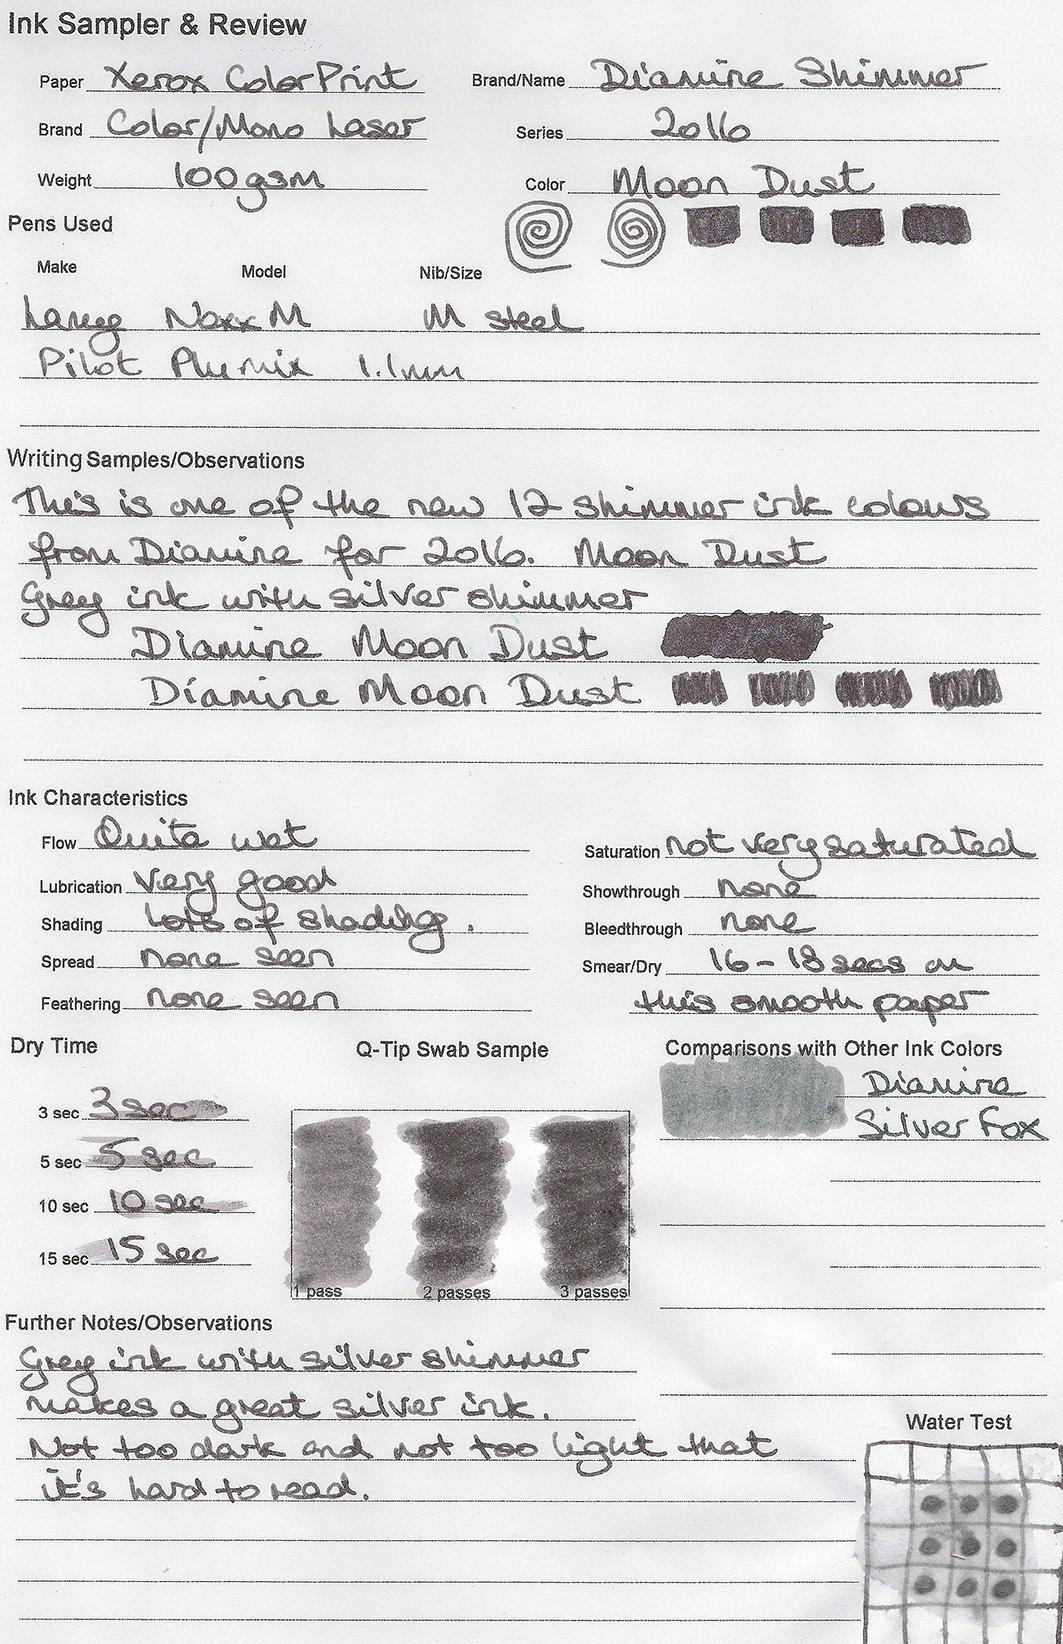 fpn_1478082643__diamine_moon_dust.jpeg